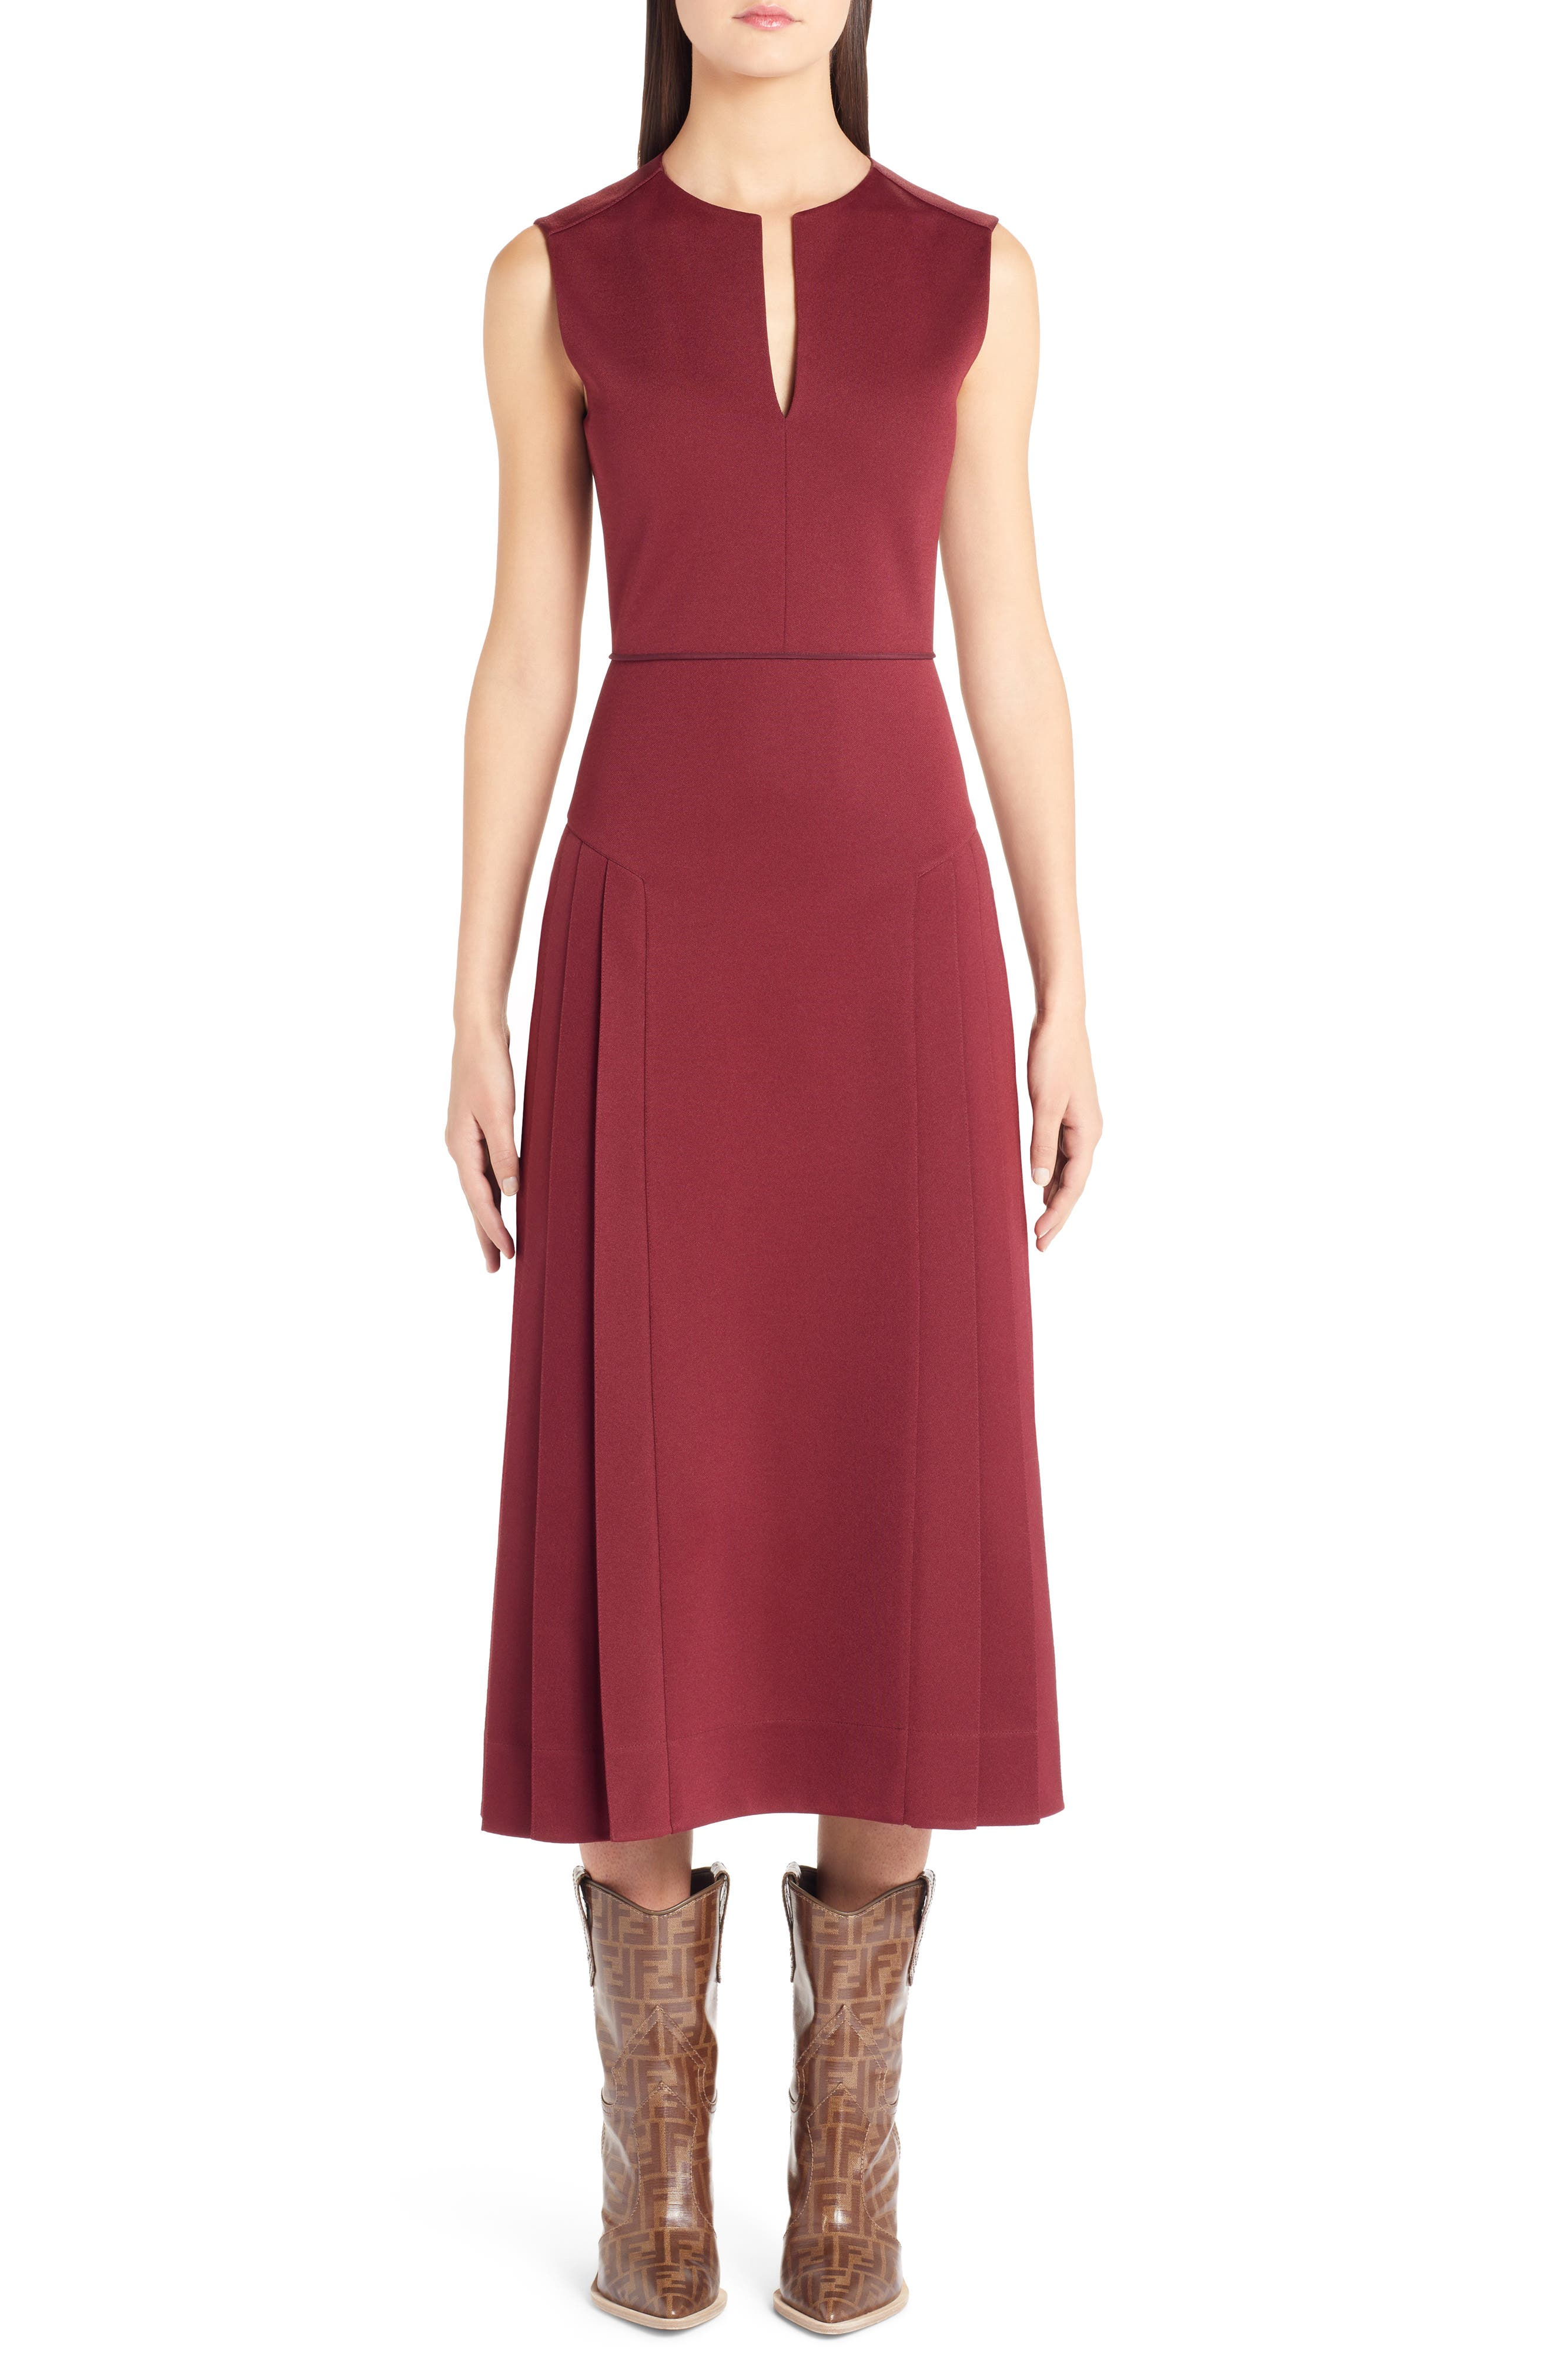 Fendi Pleated A-Line Midi Dress, 8 IT - Burgundy